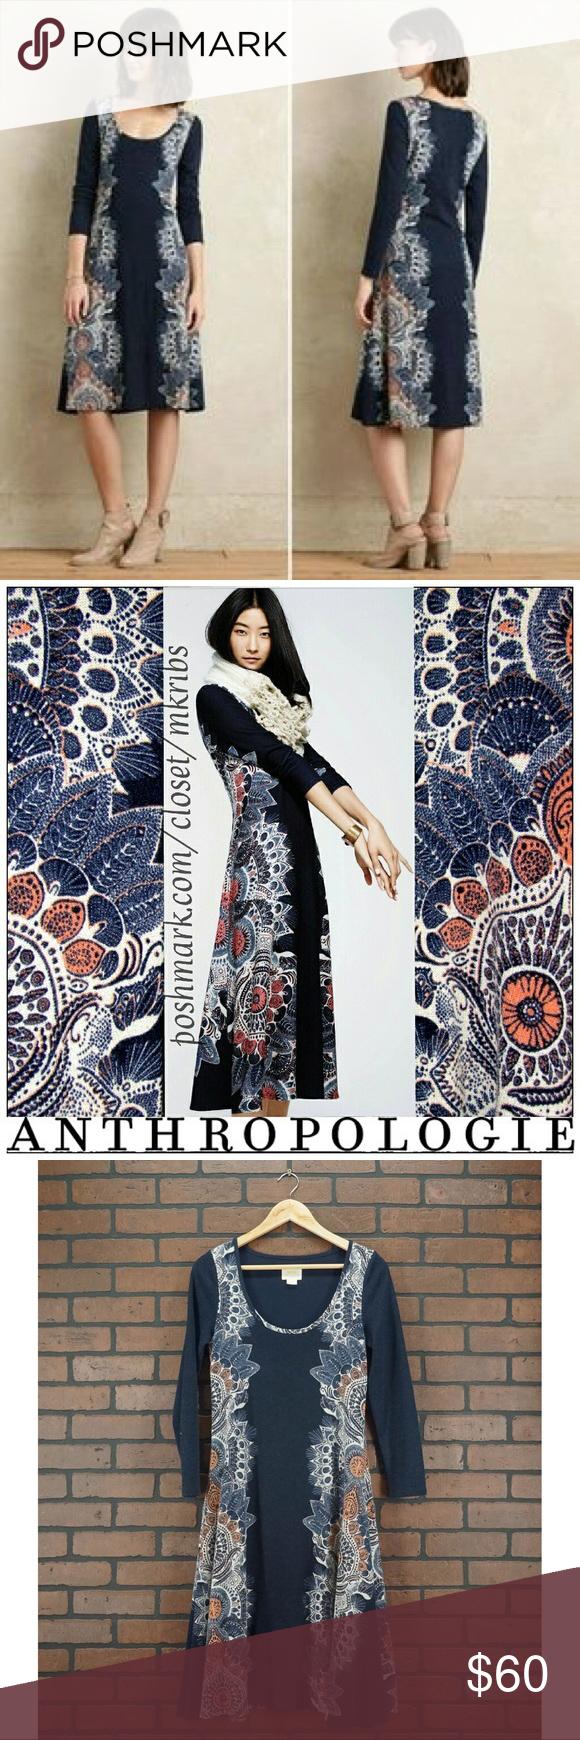 9d39cc95730 ANTHROPOLOGIE Maeve Eria Sweater Dress Size Small Brand  Anthropologie  Style  Maeve Eria Sweater Dress